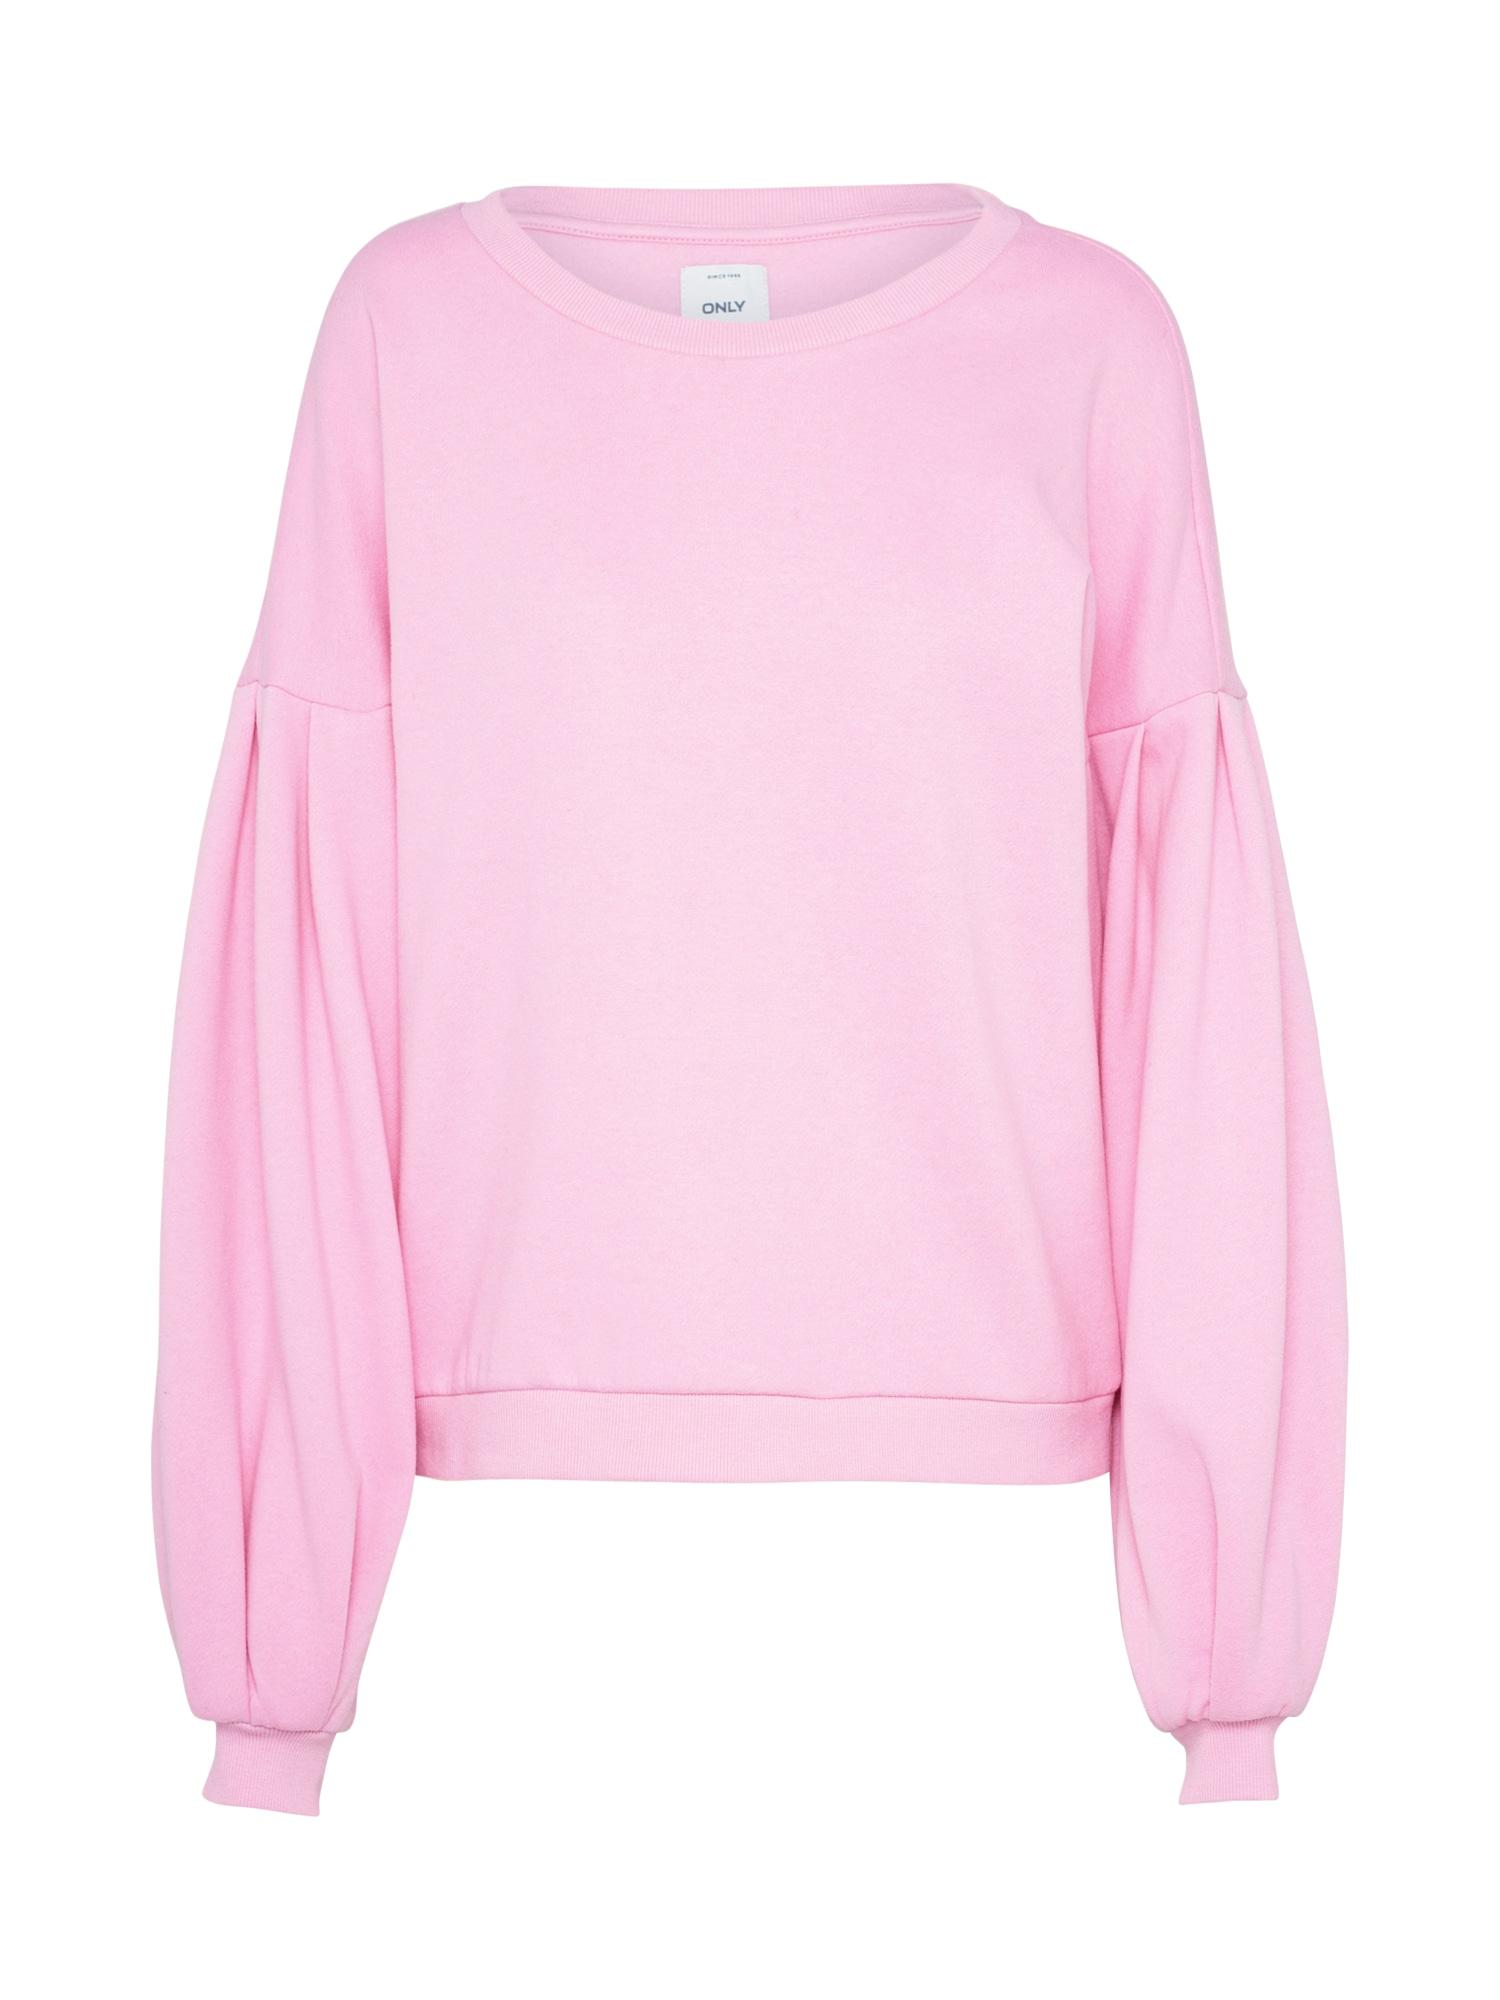 ONLY, Dames Sweatshirt 'ABSOLUTE', lichtroze